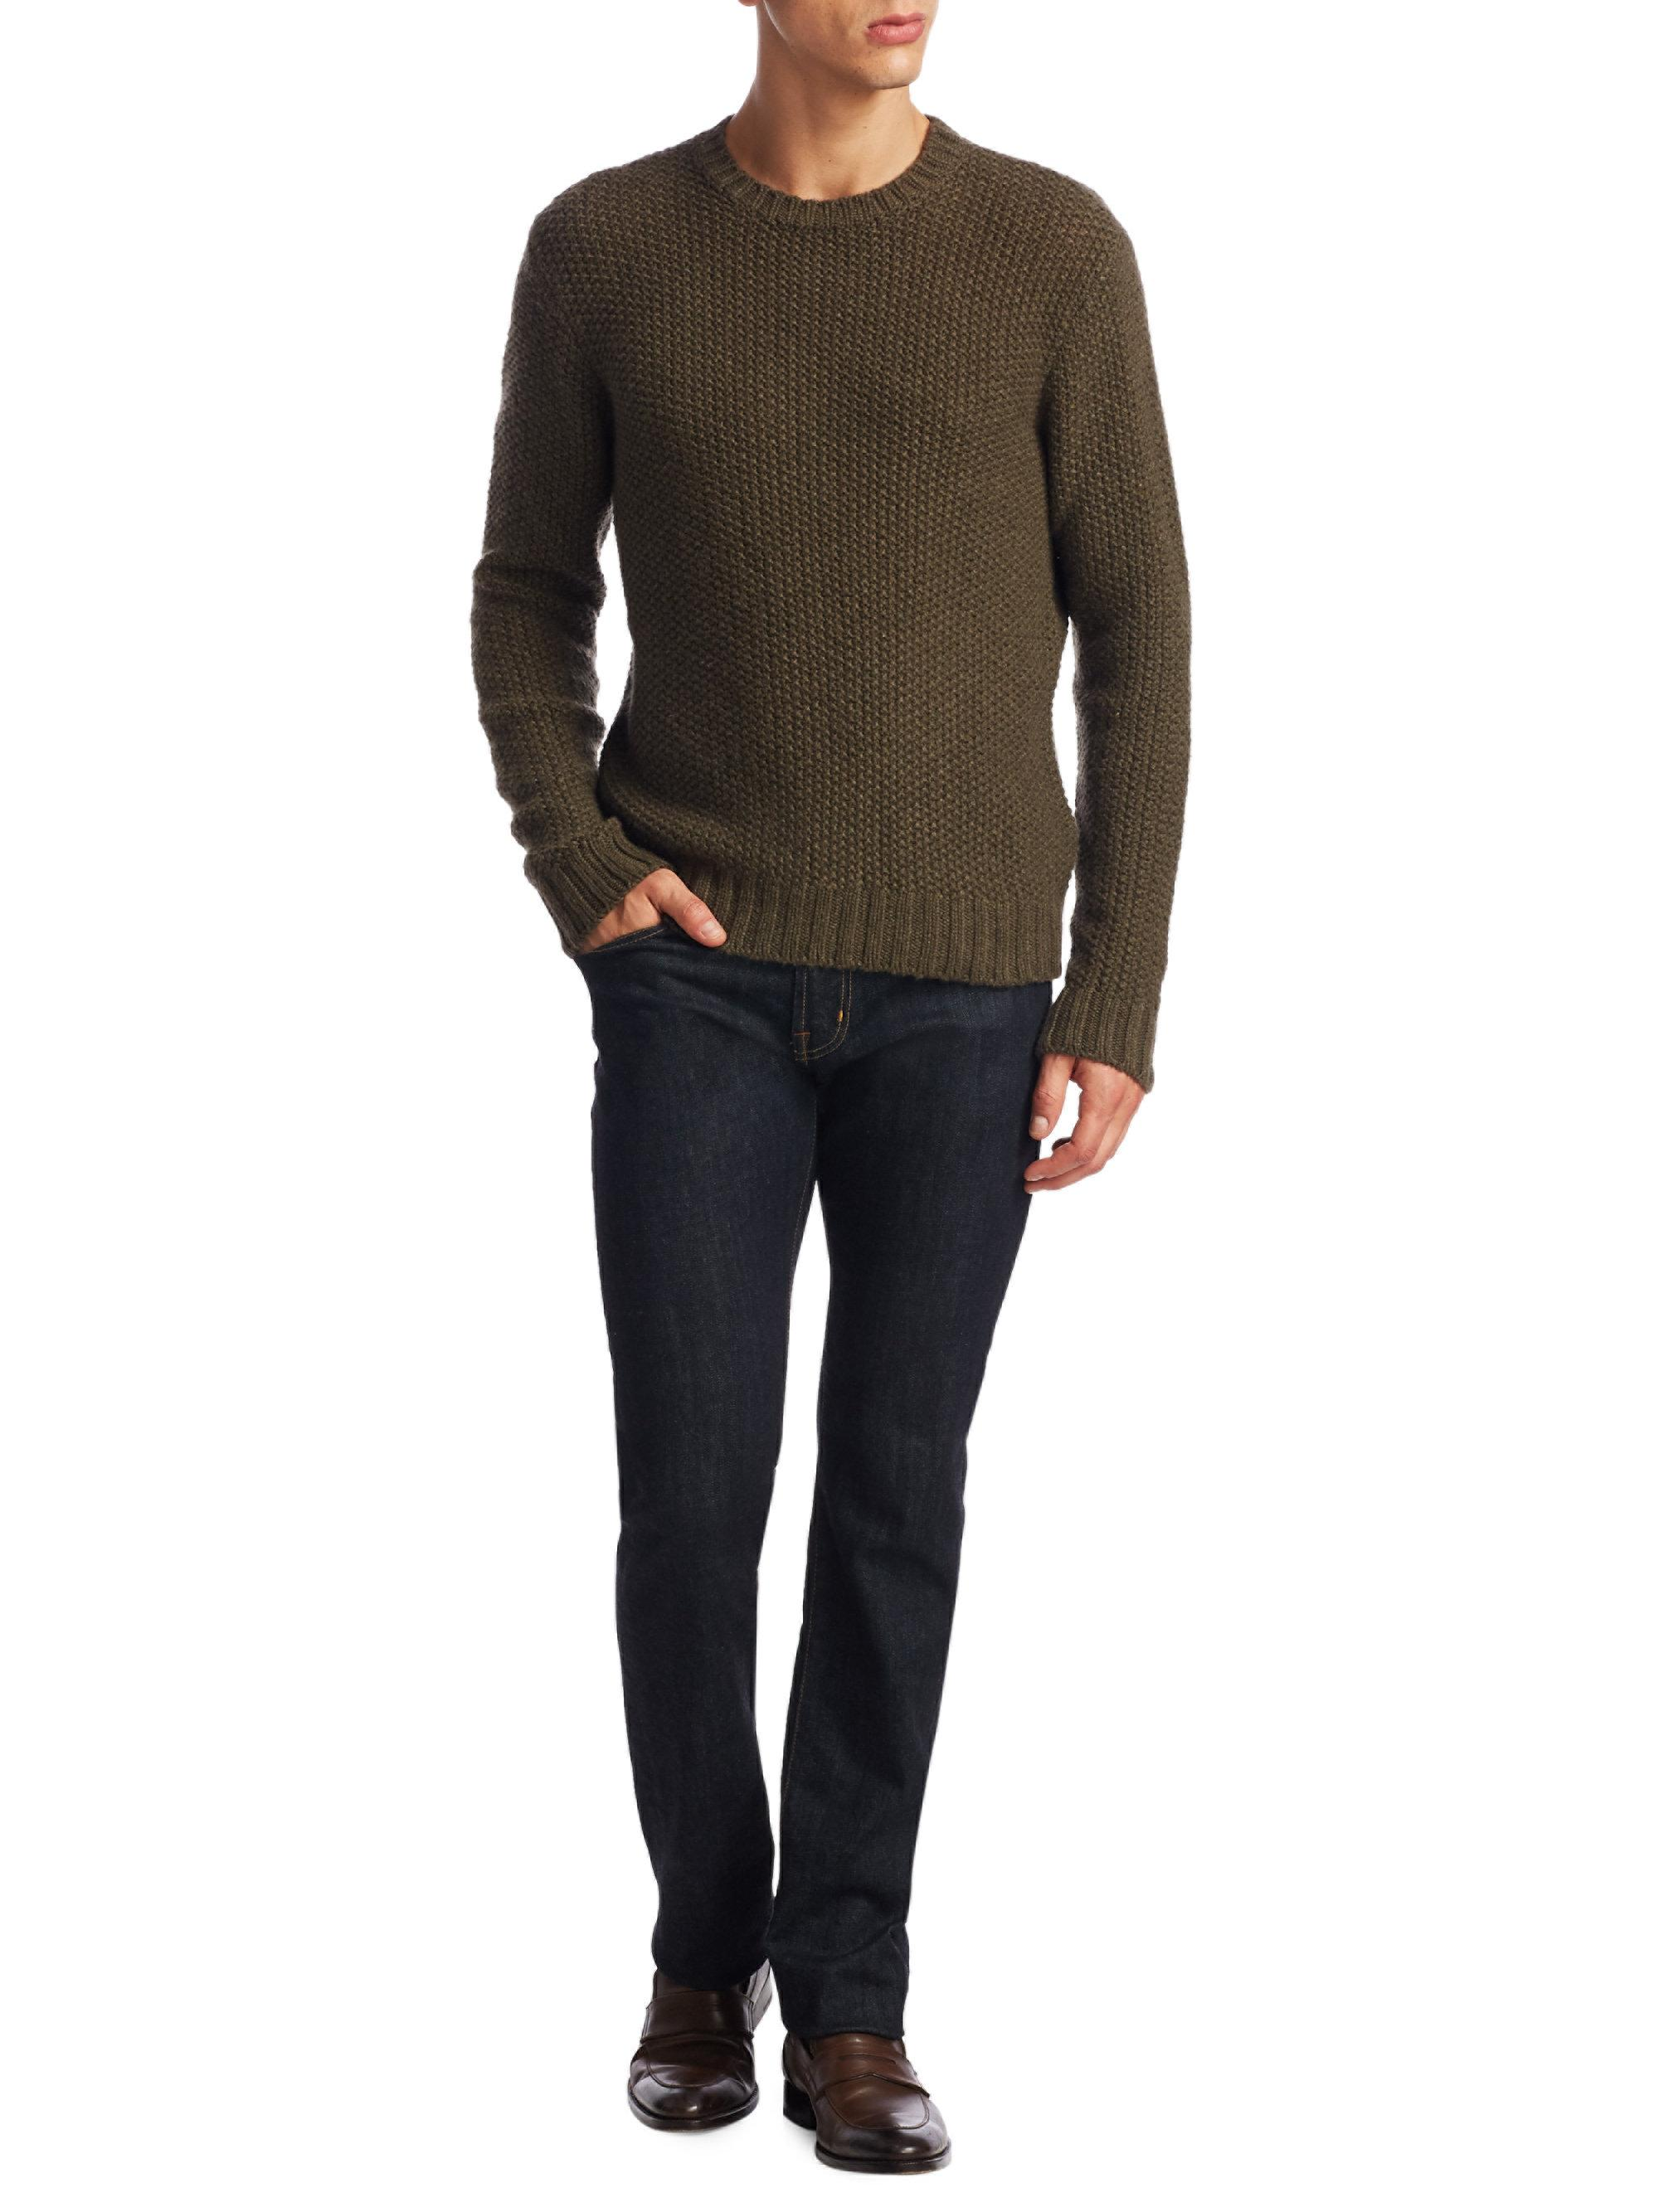 6386dfb73 ... men f868c 63f22  italy lyst ralph lauren purple label cash seed  cashmere sweater in green ff4c6 2d947